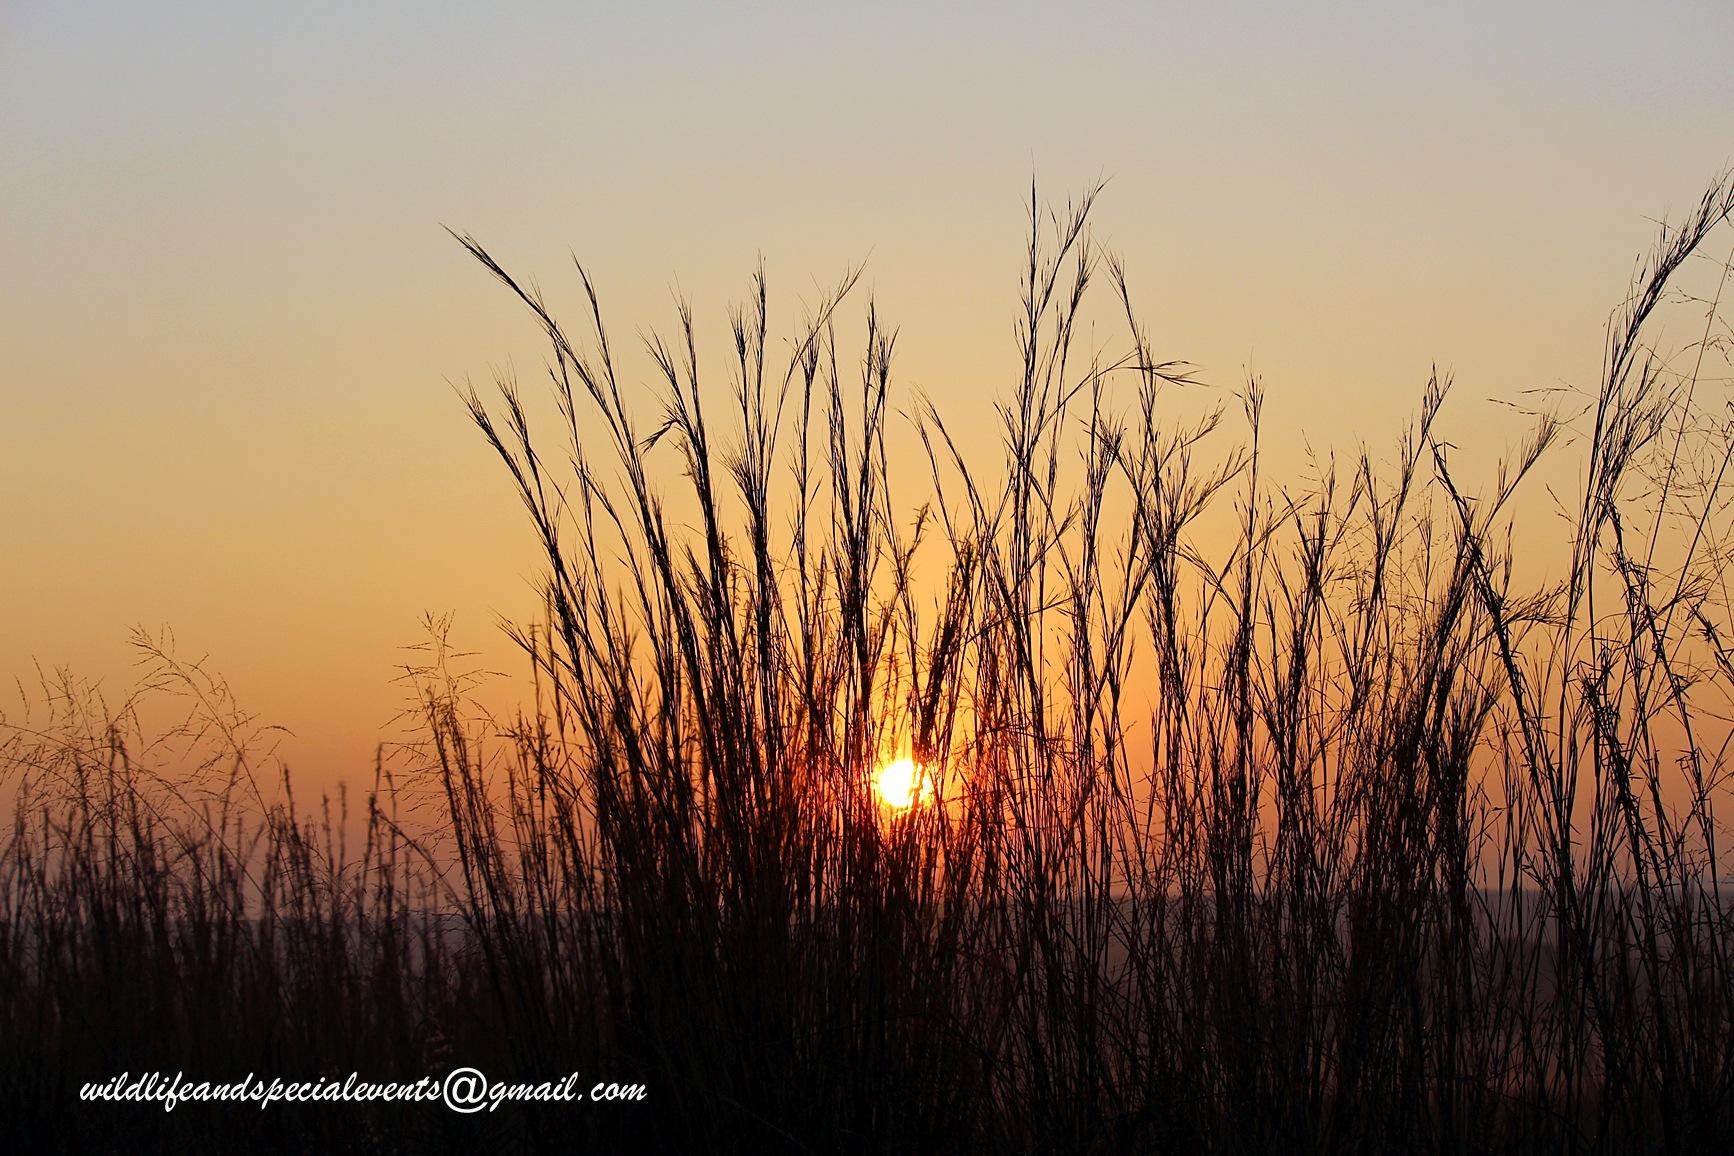 Sunrise in Africa by oosie